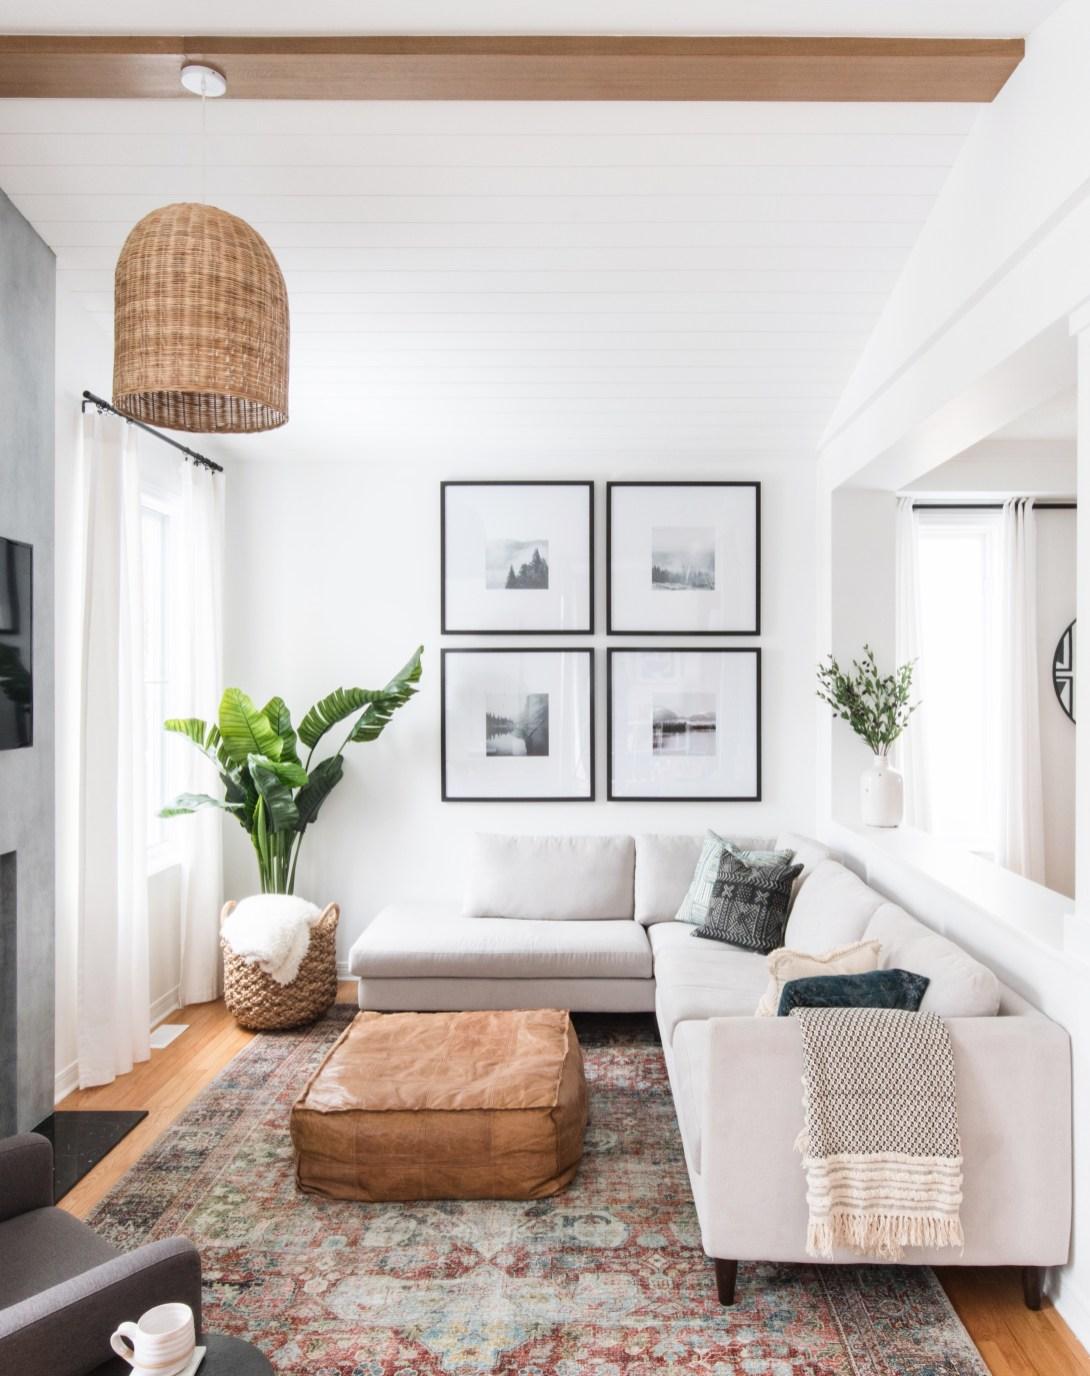 Interior by Leclair Decor